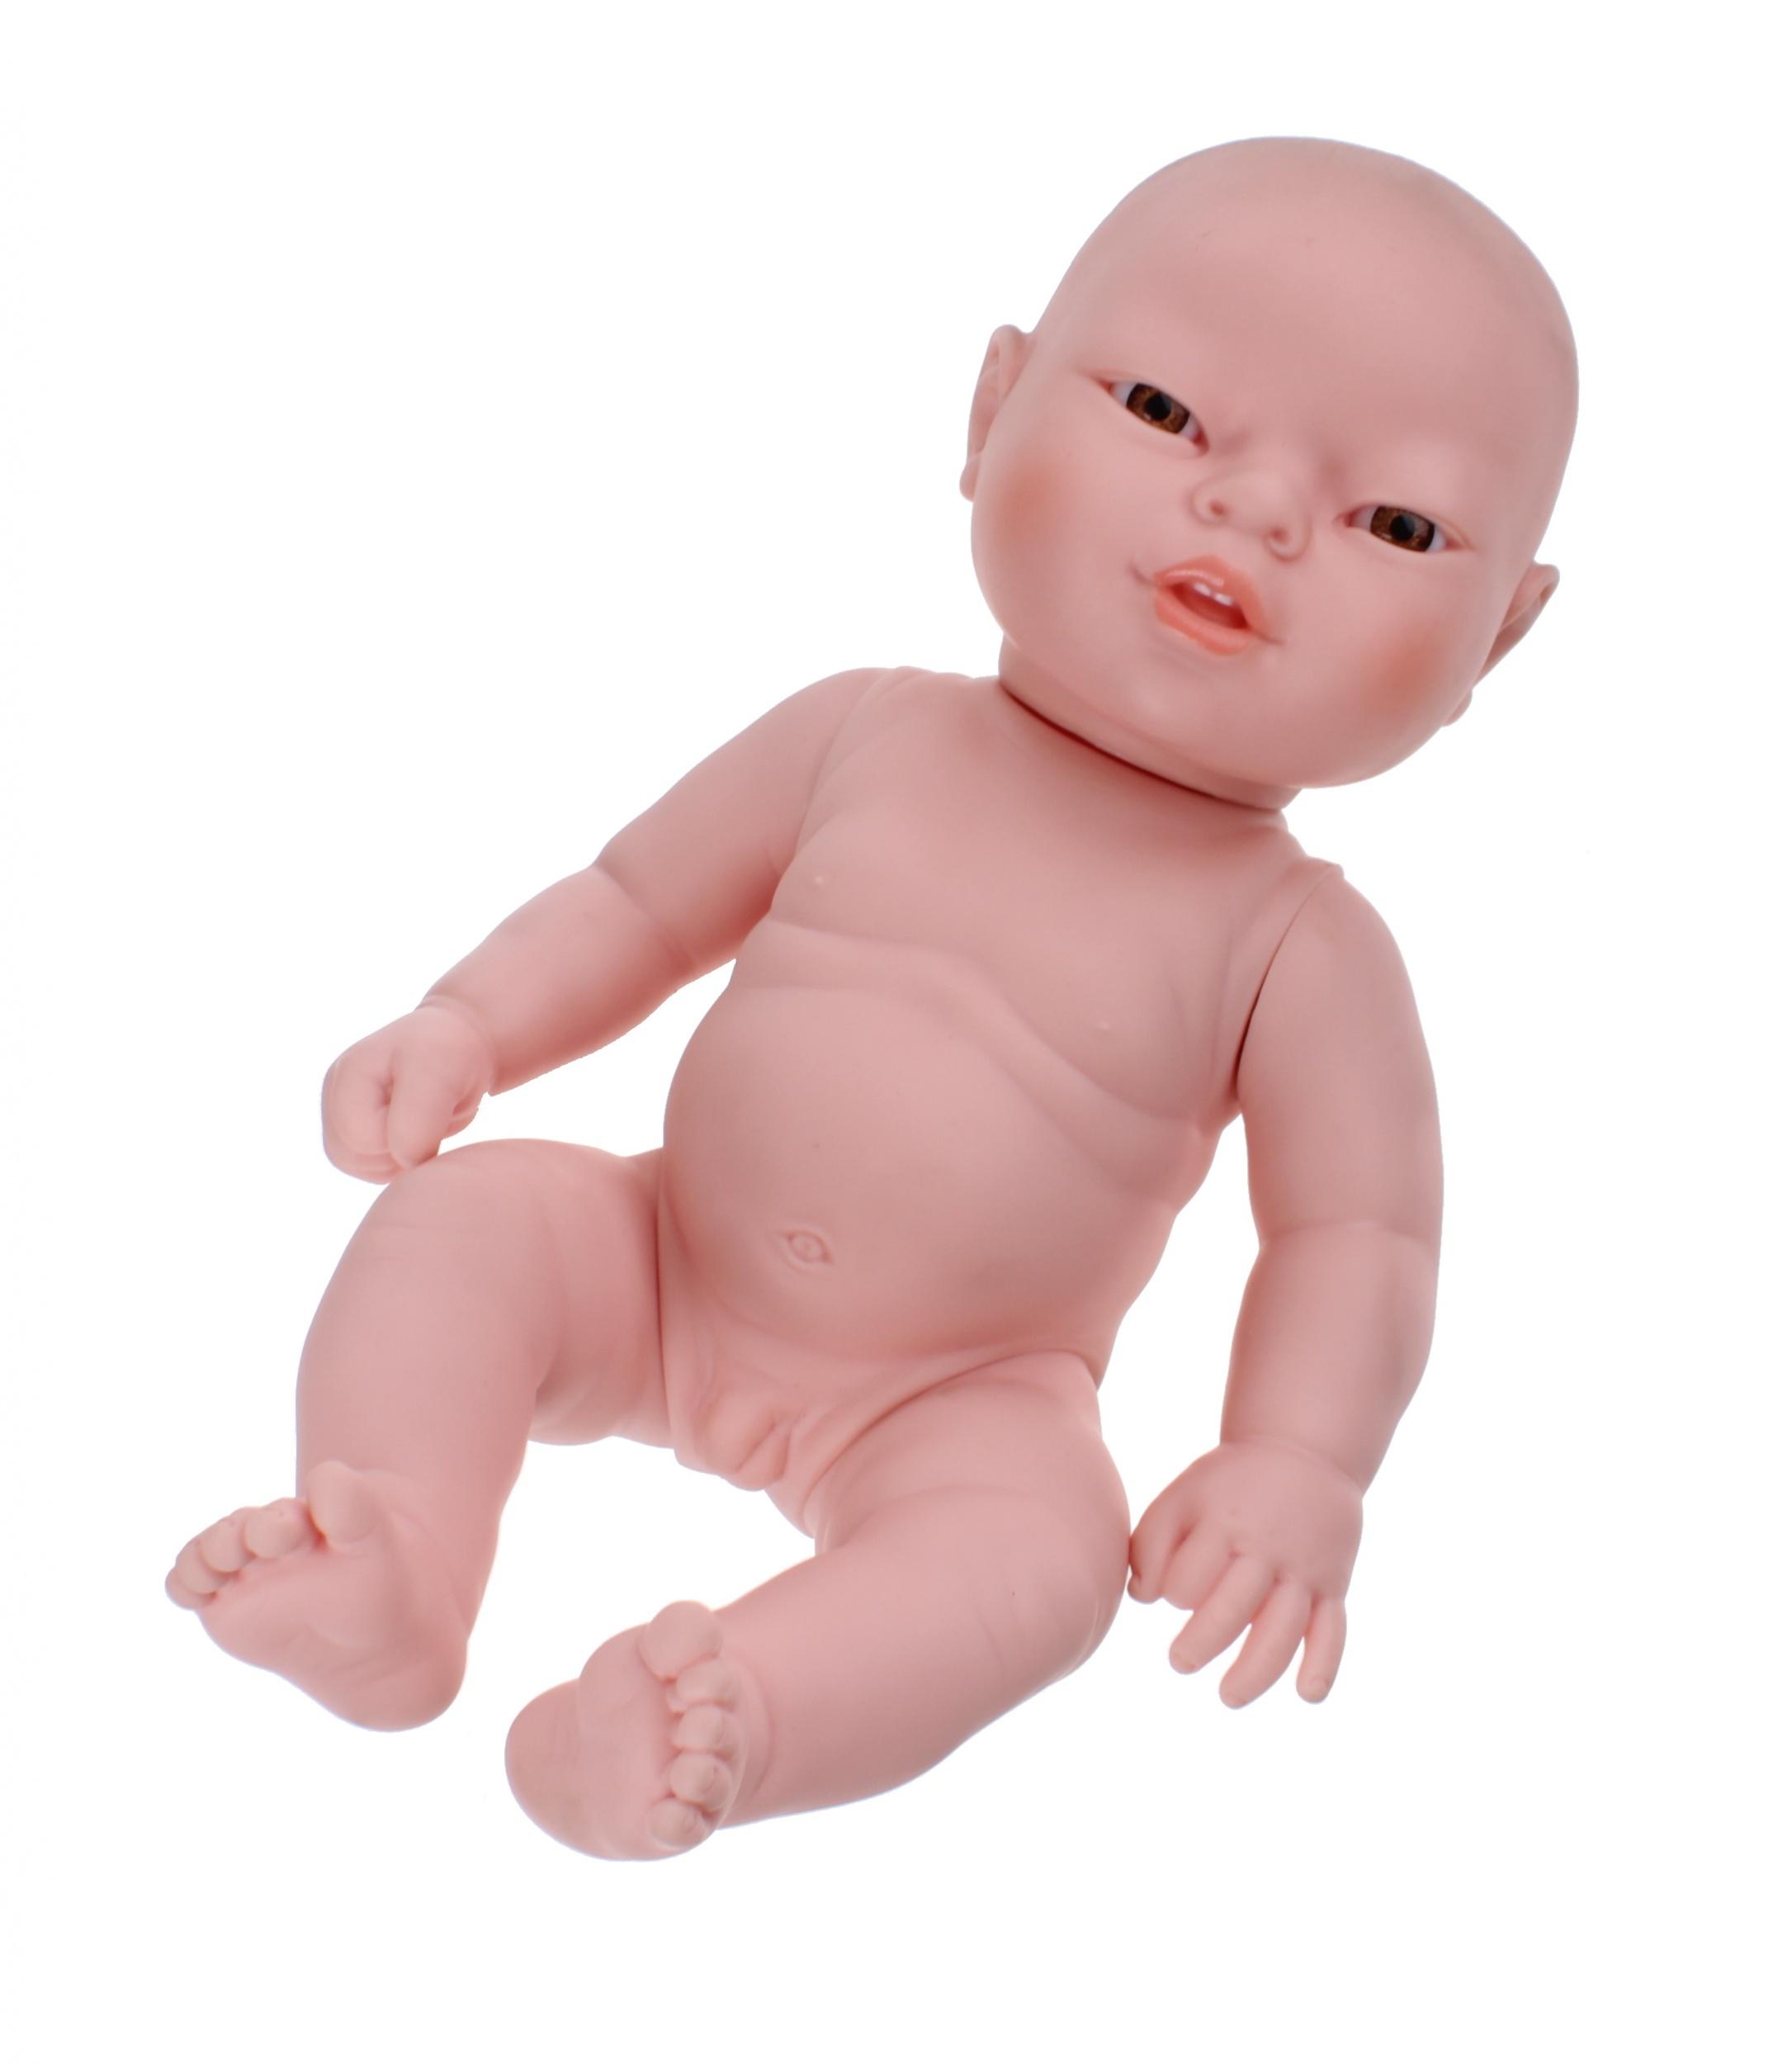 7ca3e76f3d0 Berjuan baby doll without clothes Newborn Asian 30 cm boy - Internet ...